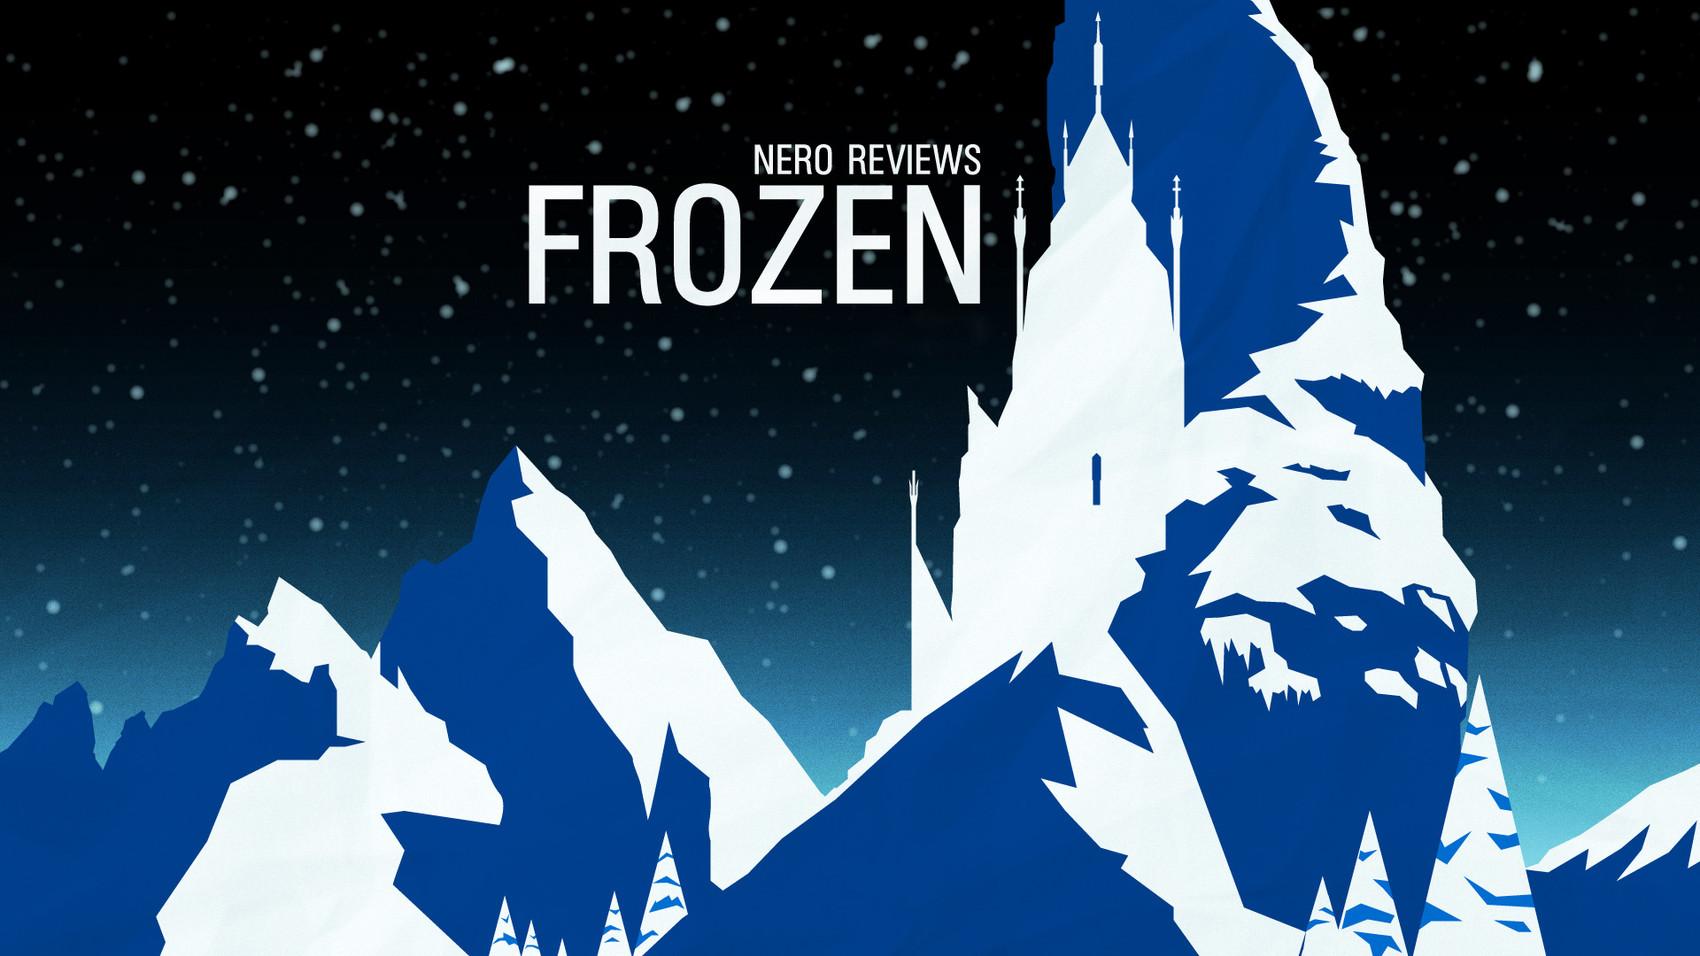 Frozen_title_card.jpg